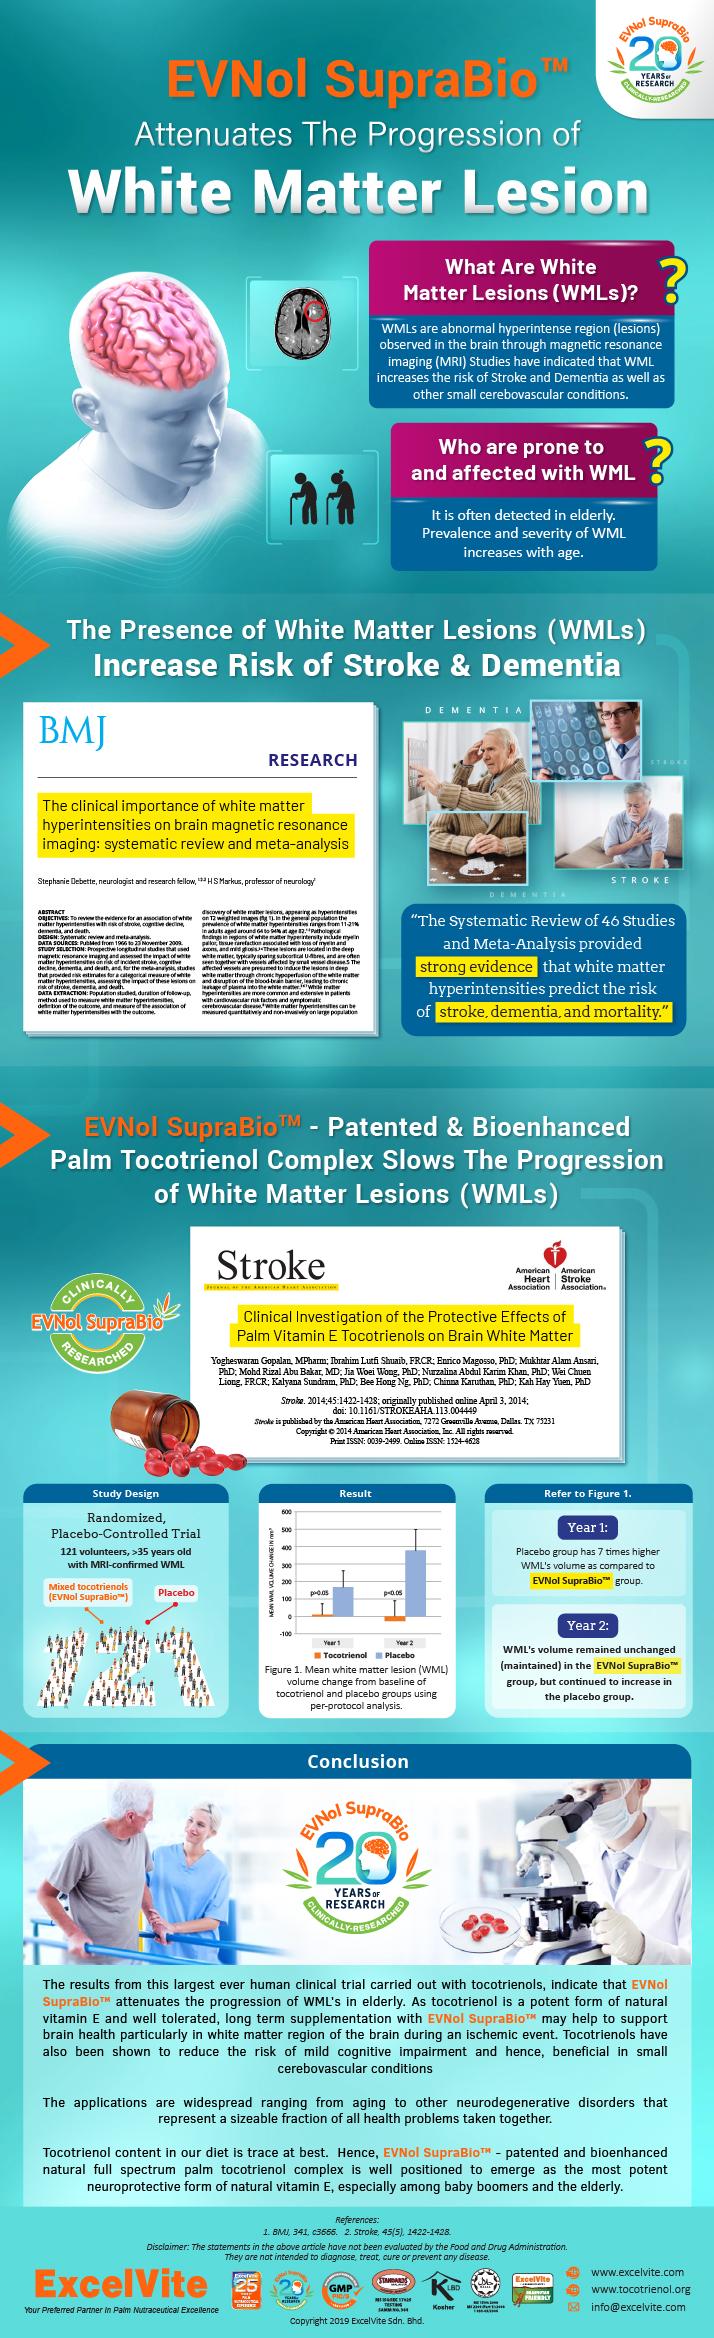 EVNol SupraBio Attenuates White Matter Lesions